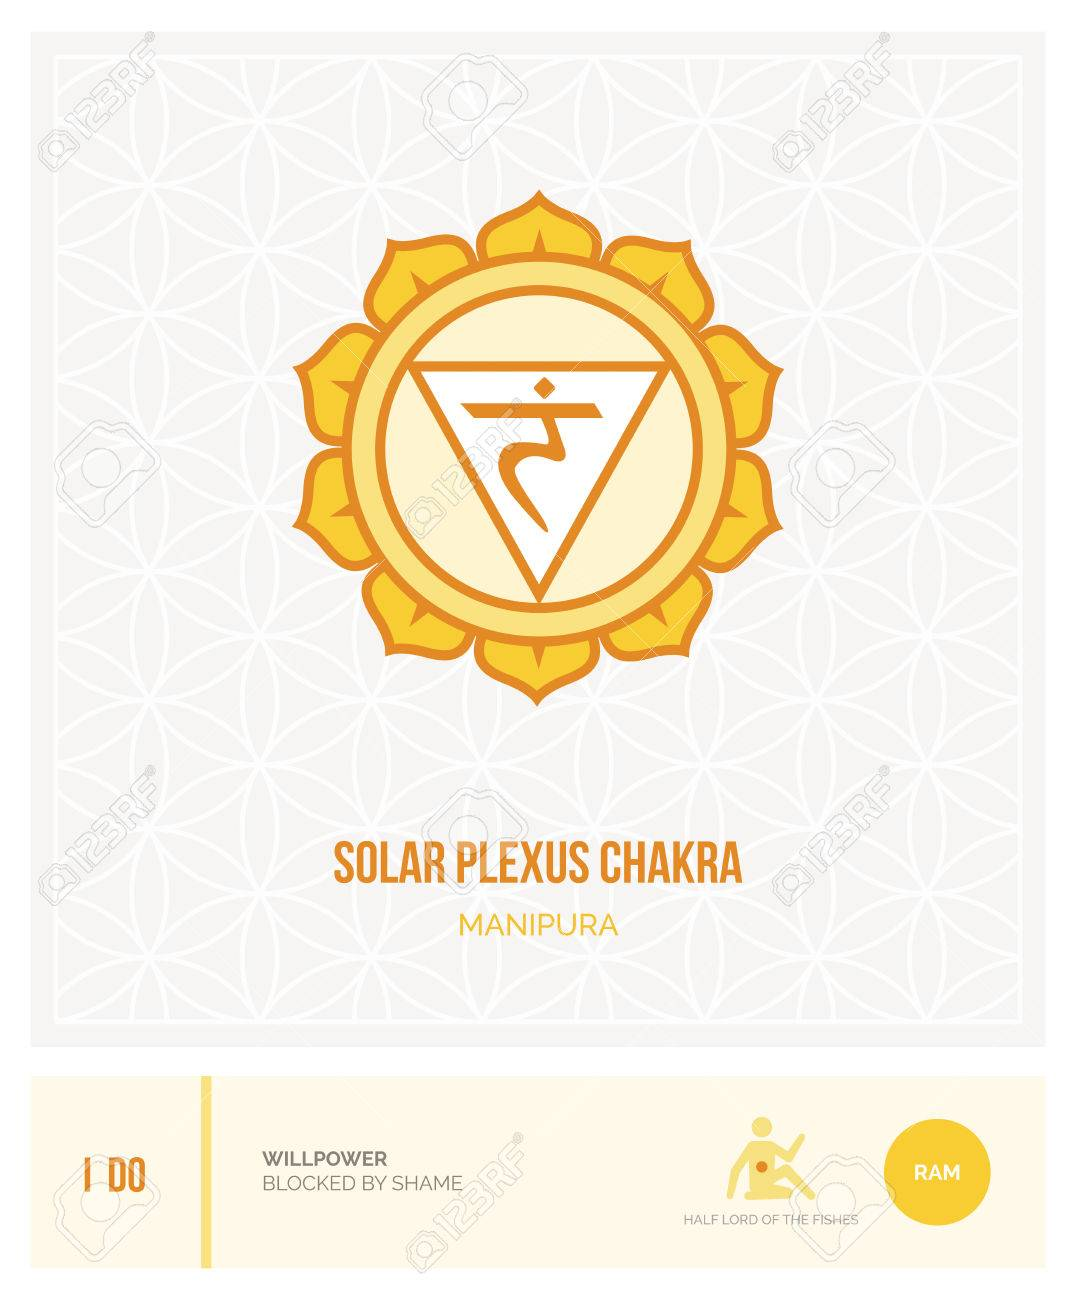 Solar plexus chakra Manipura: chakras, energy healing and yoga